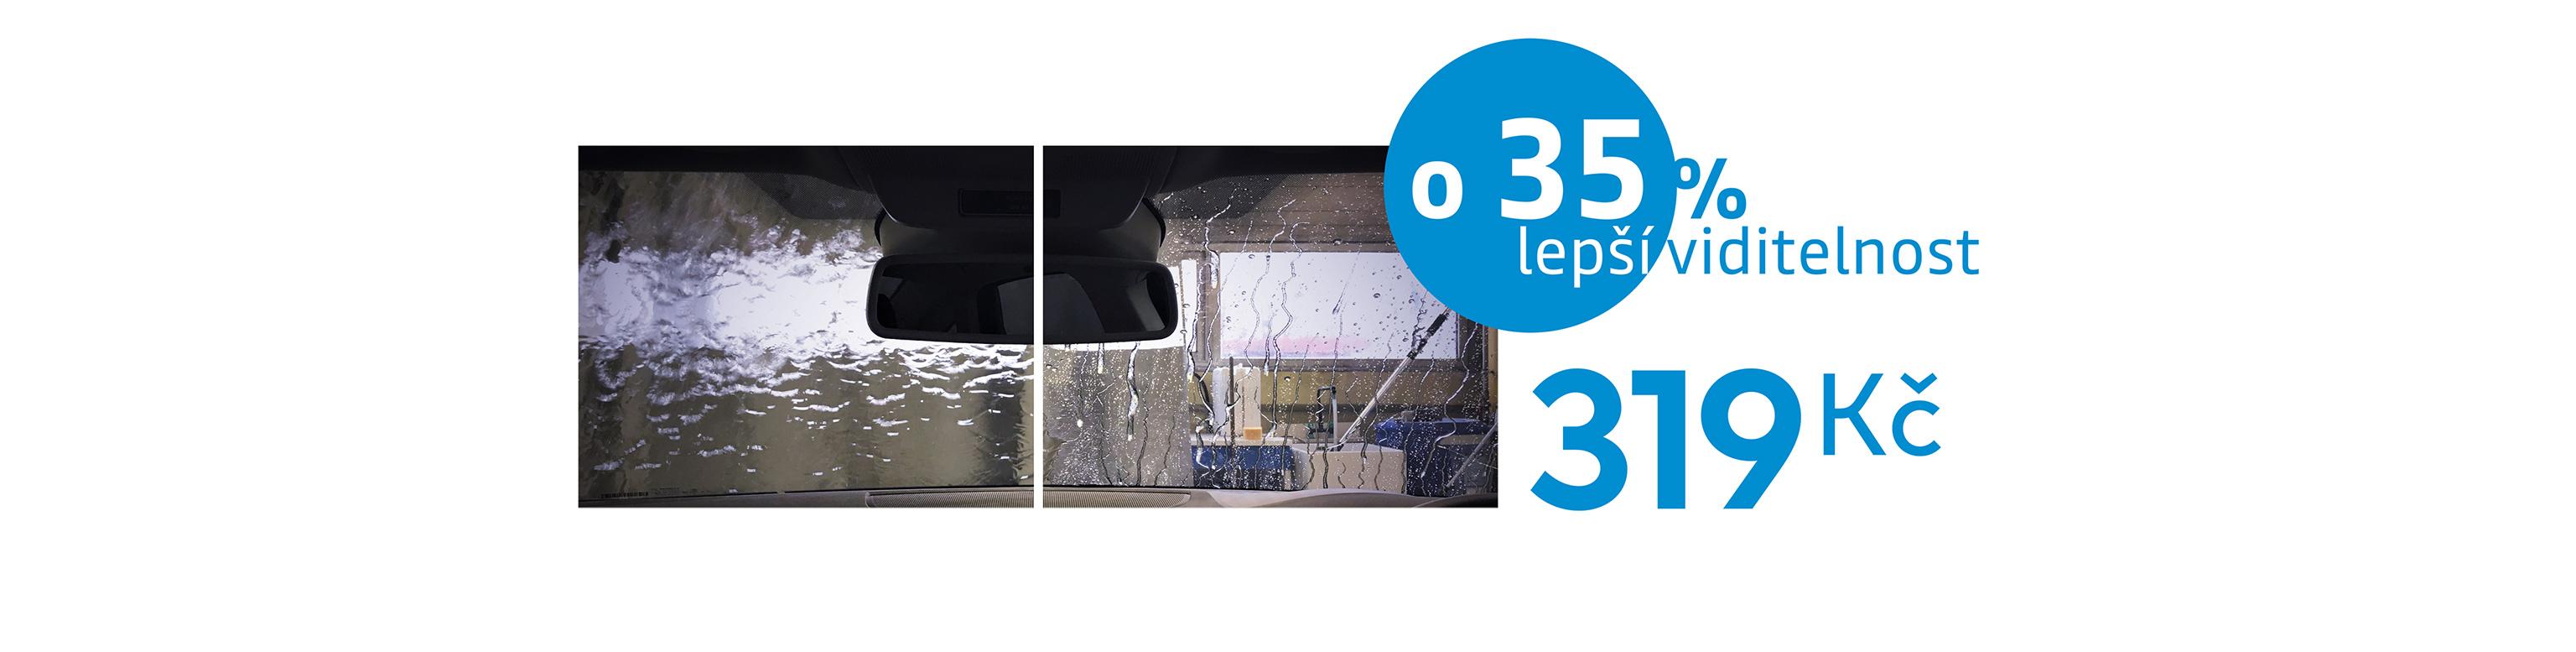 3072x777-baner-rain-protect-cz-waski.jpg